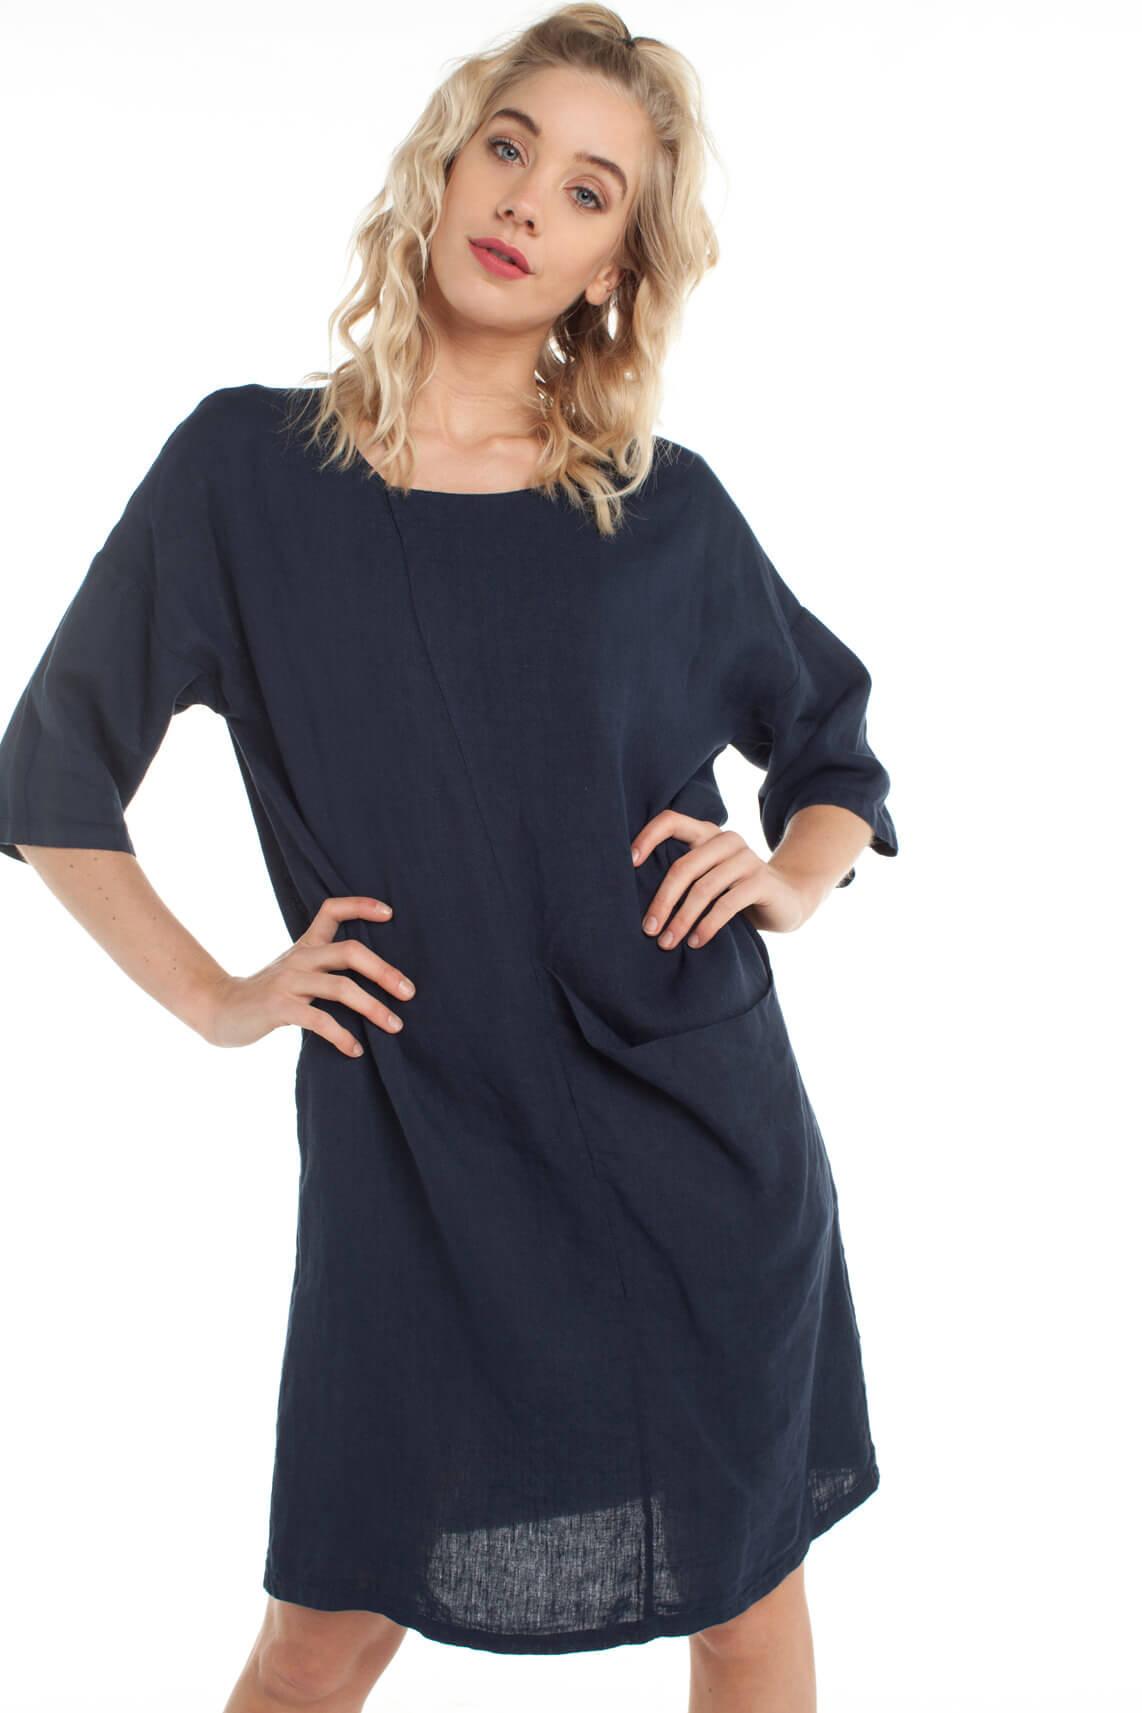 La Fée Maraboutée Dames Linnen jurk Blauw